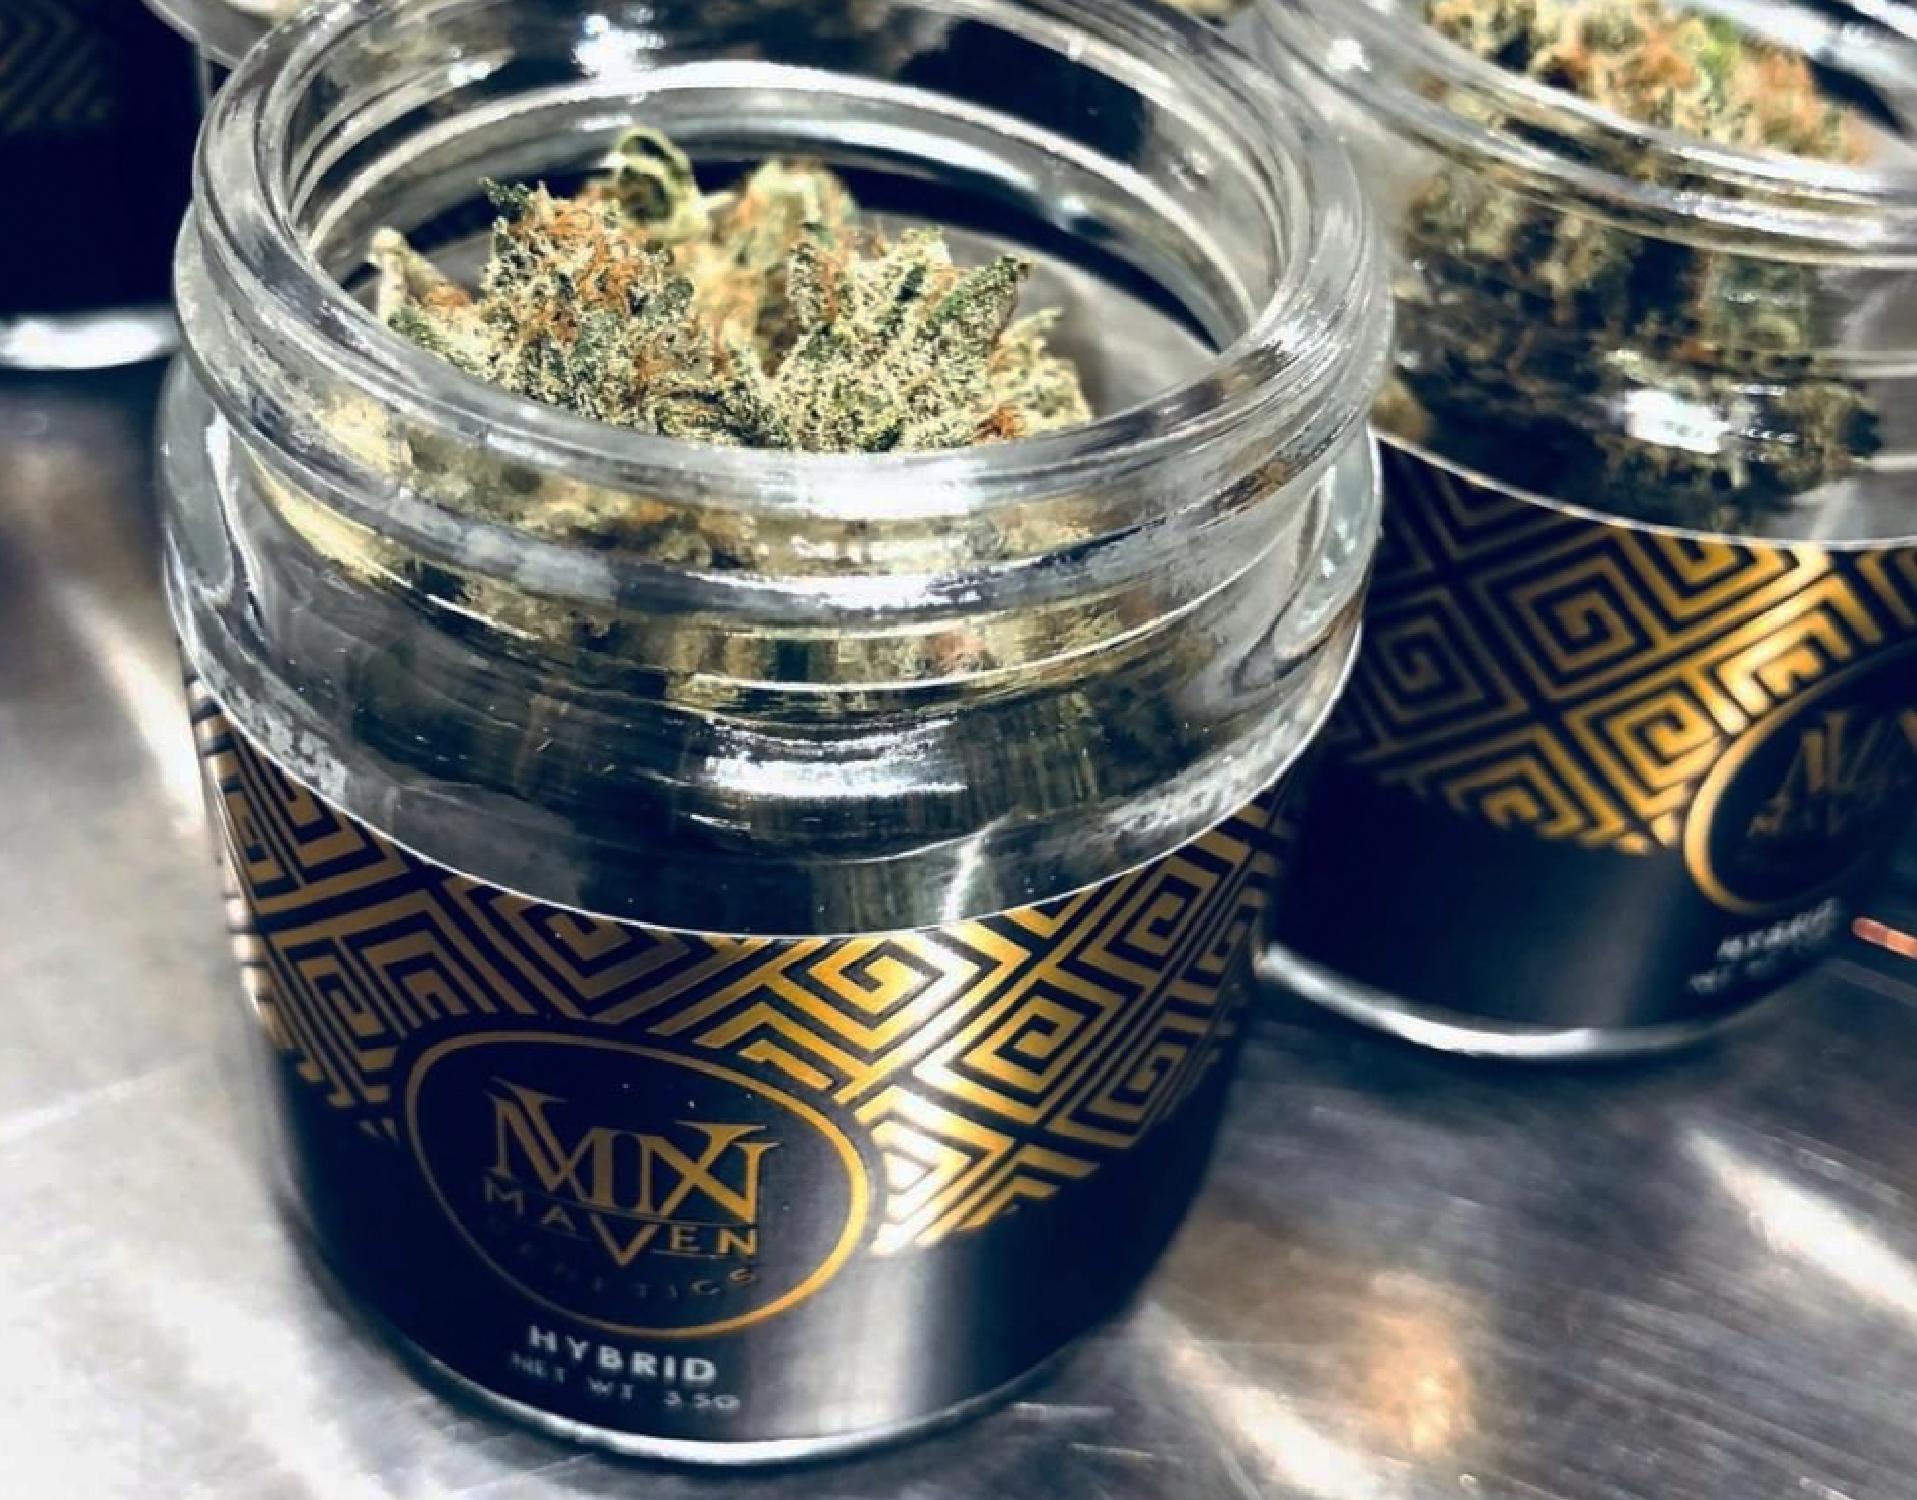 Maven Cannabis The New Smoker